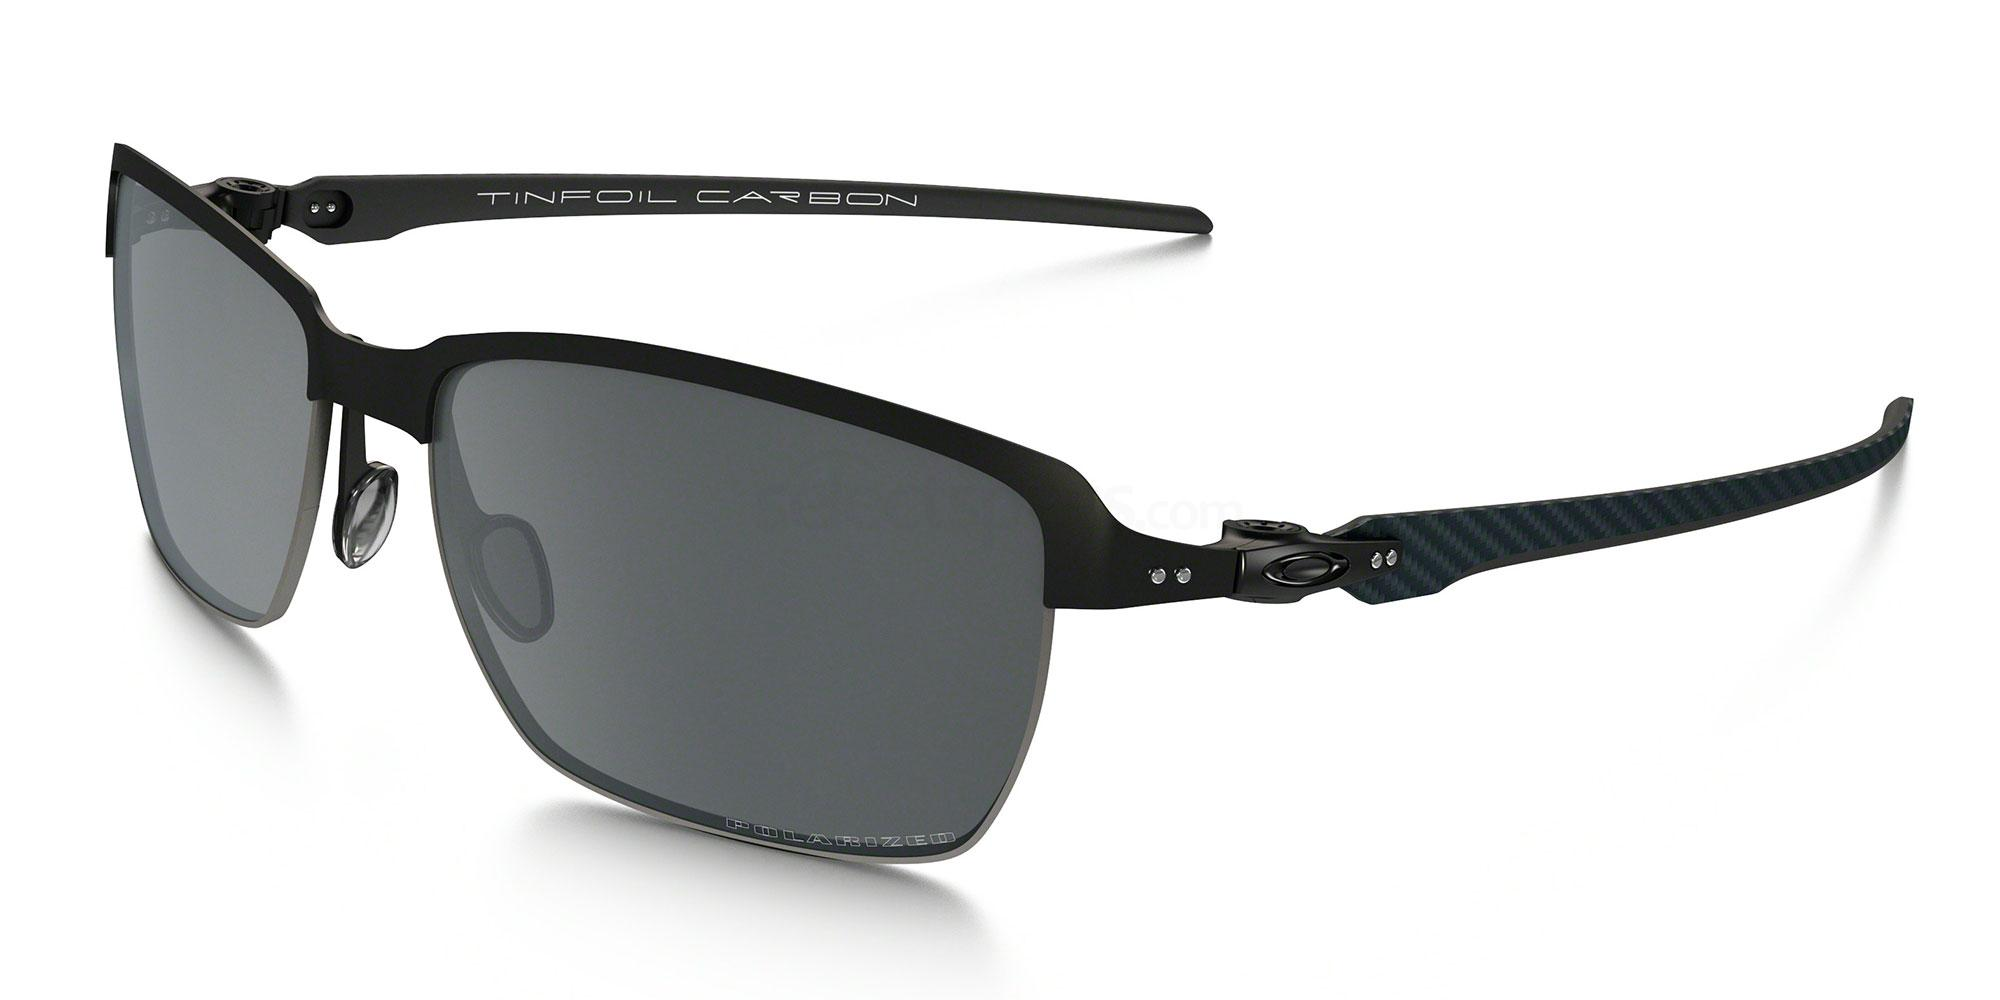 601802 OO6018 TINFOIL CARBON (Polarized) Sunglasses, Oakley